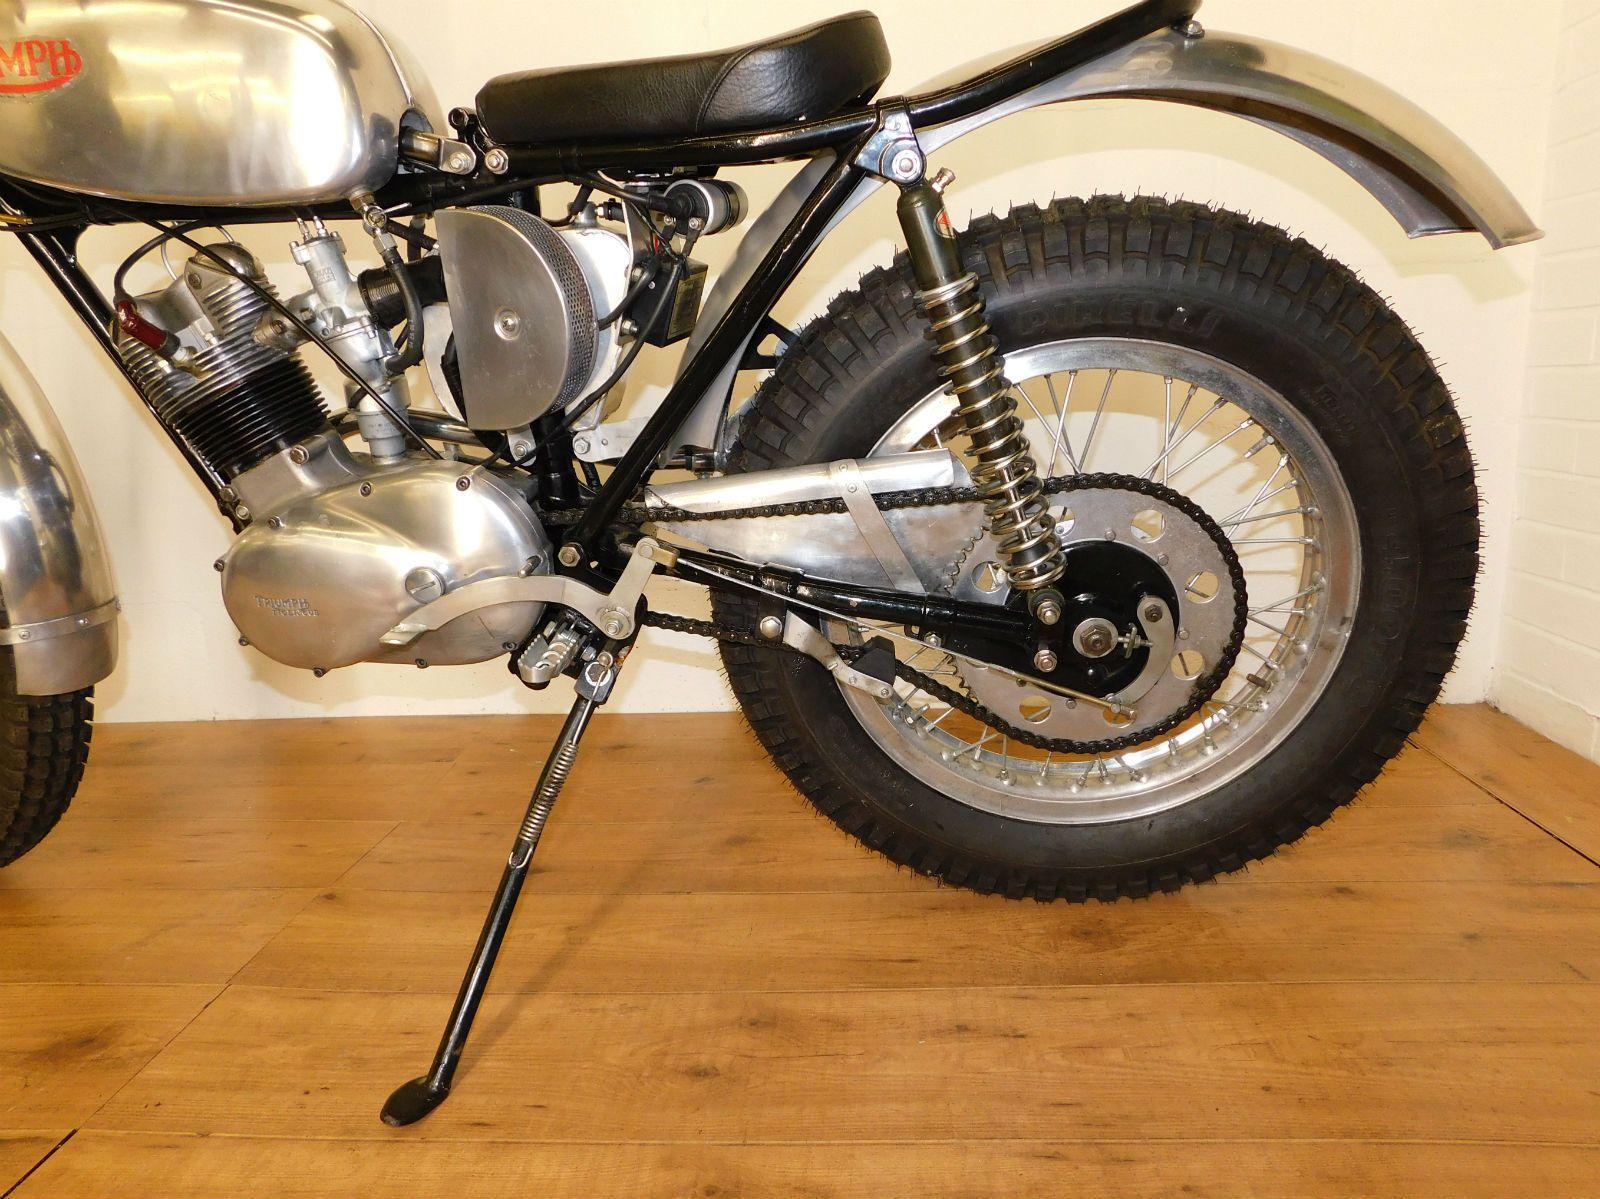 Triumph Tiger Cub Vintage Trials Full Engine Rebuild Lovely Bike